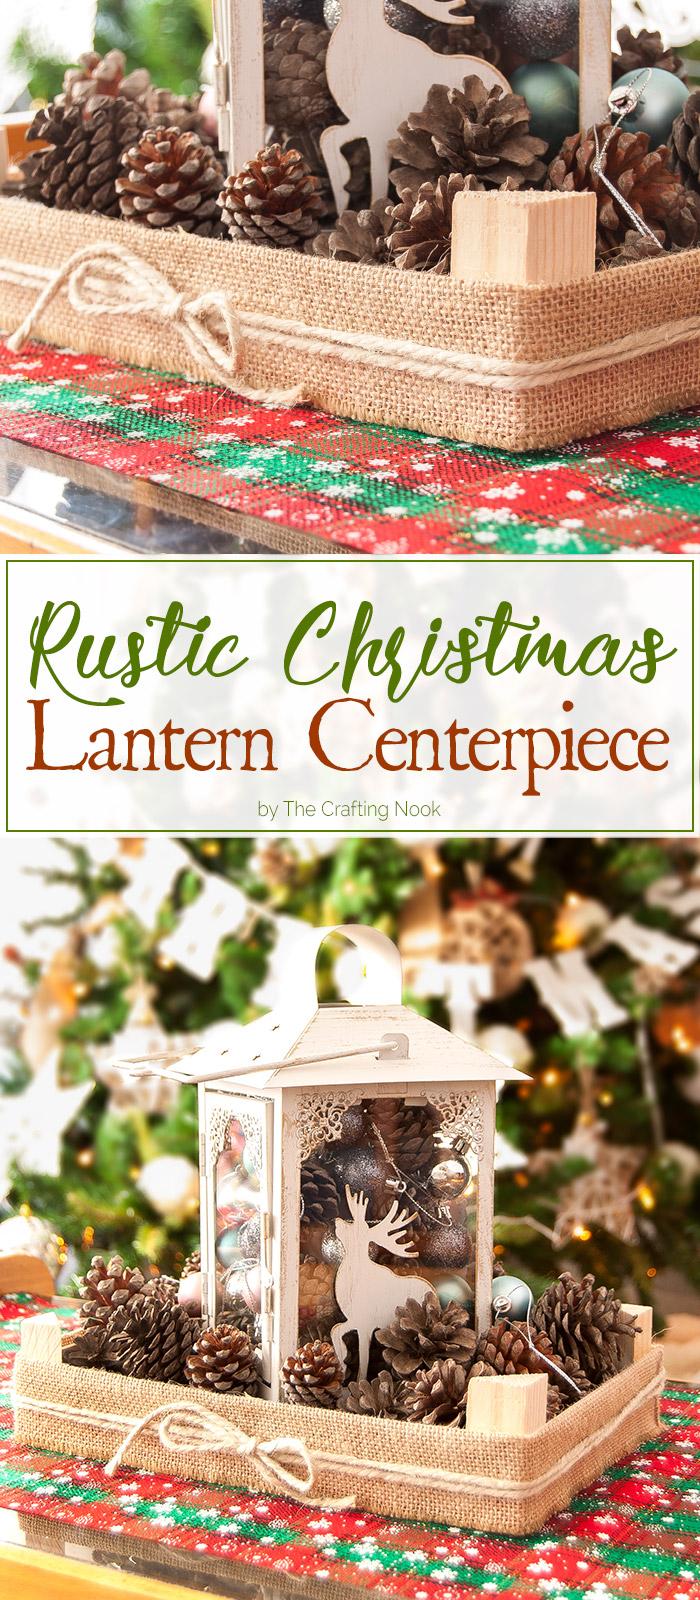 DIY Rustic Christmas Lantern Centerpiece